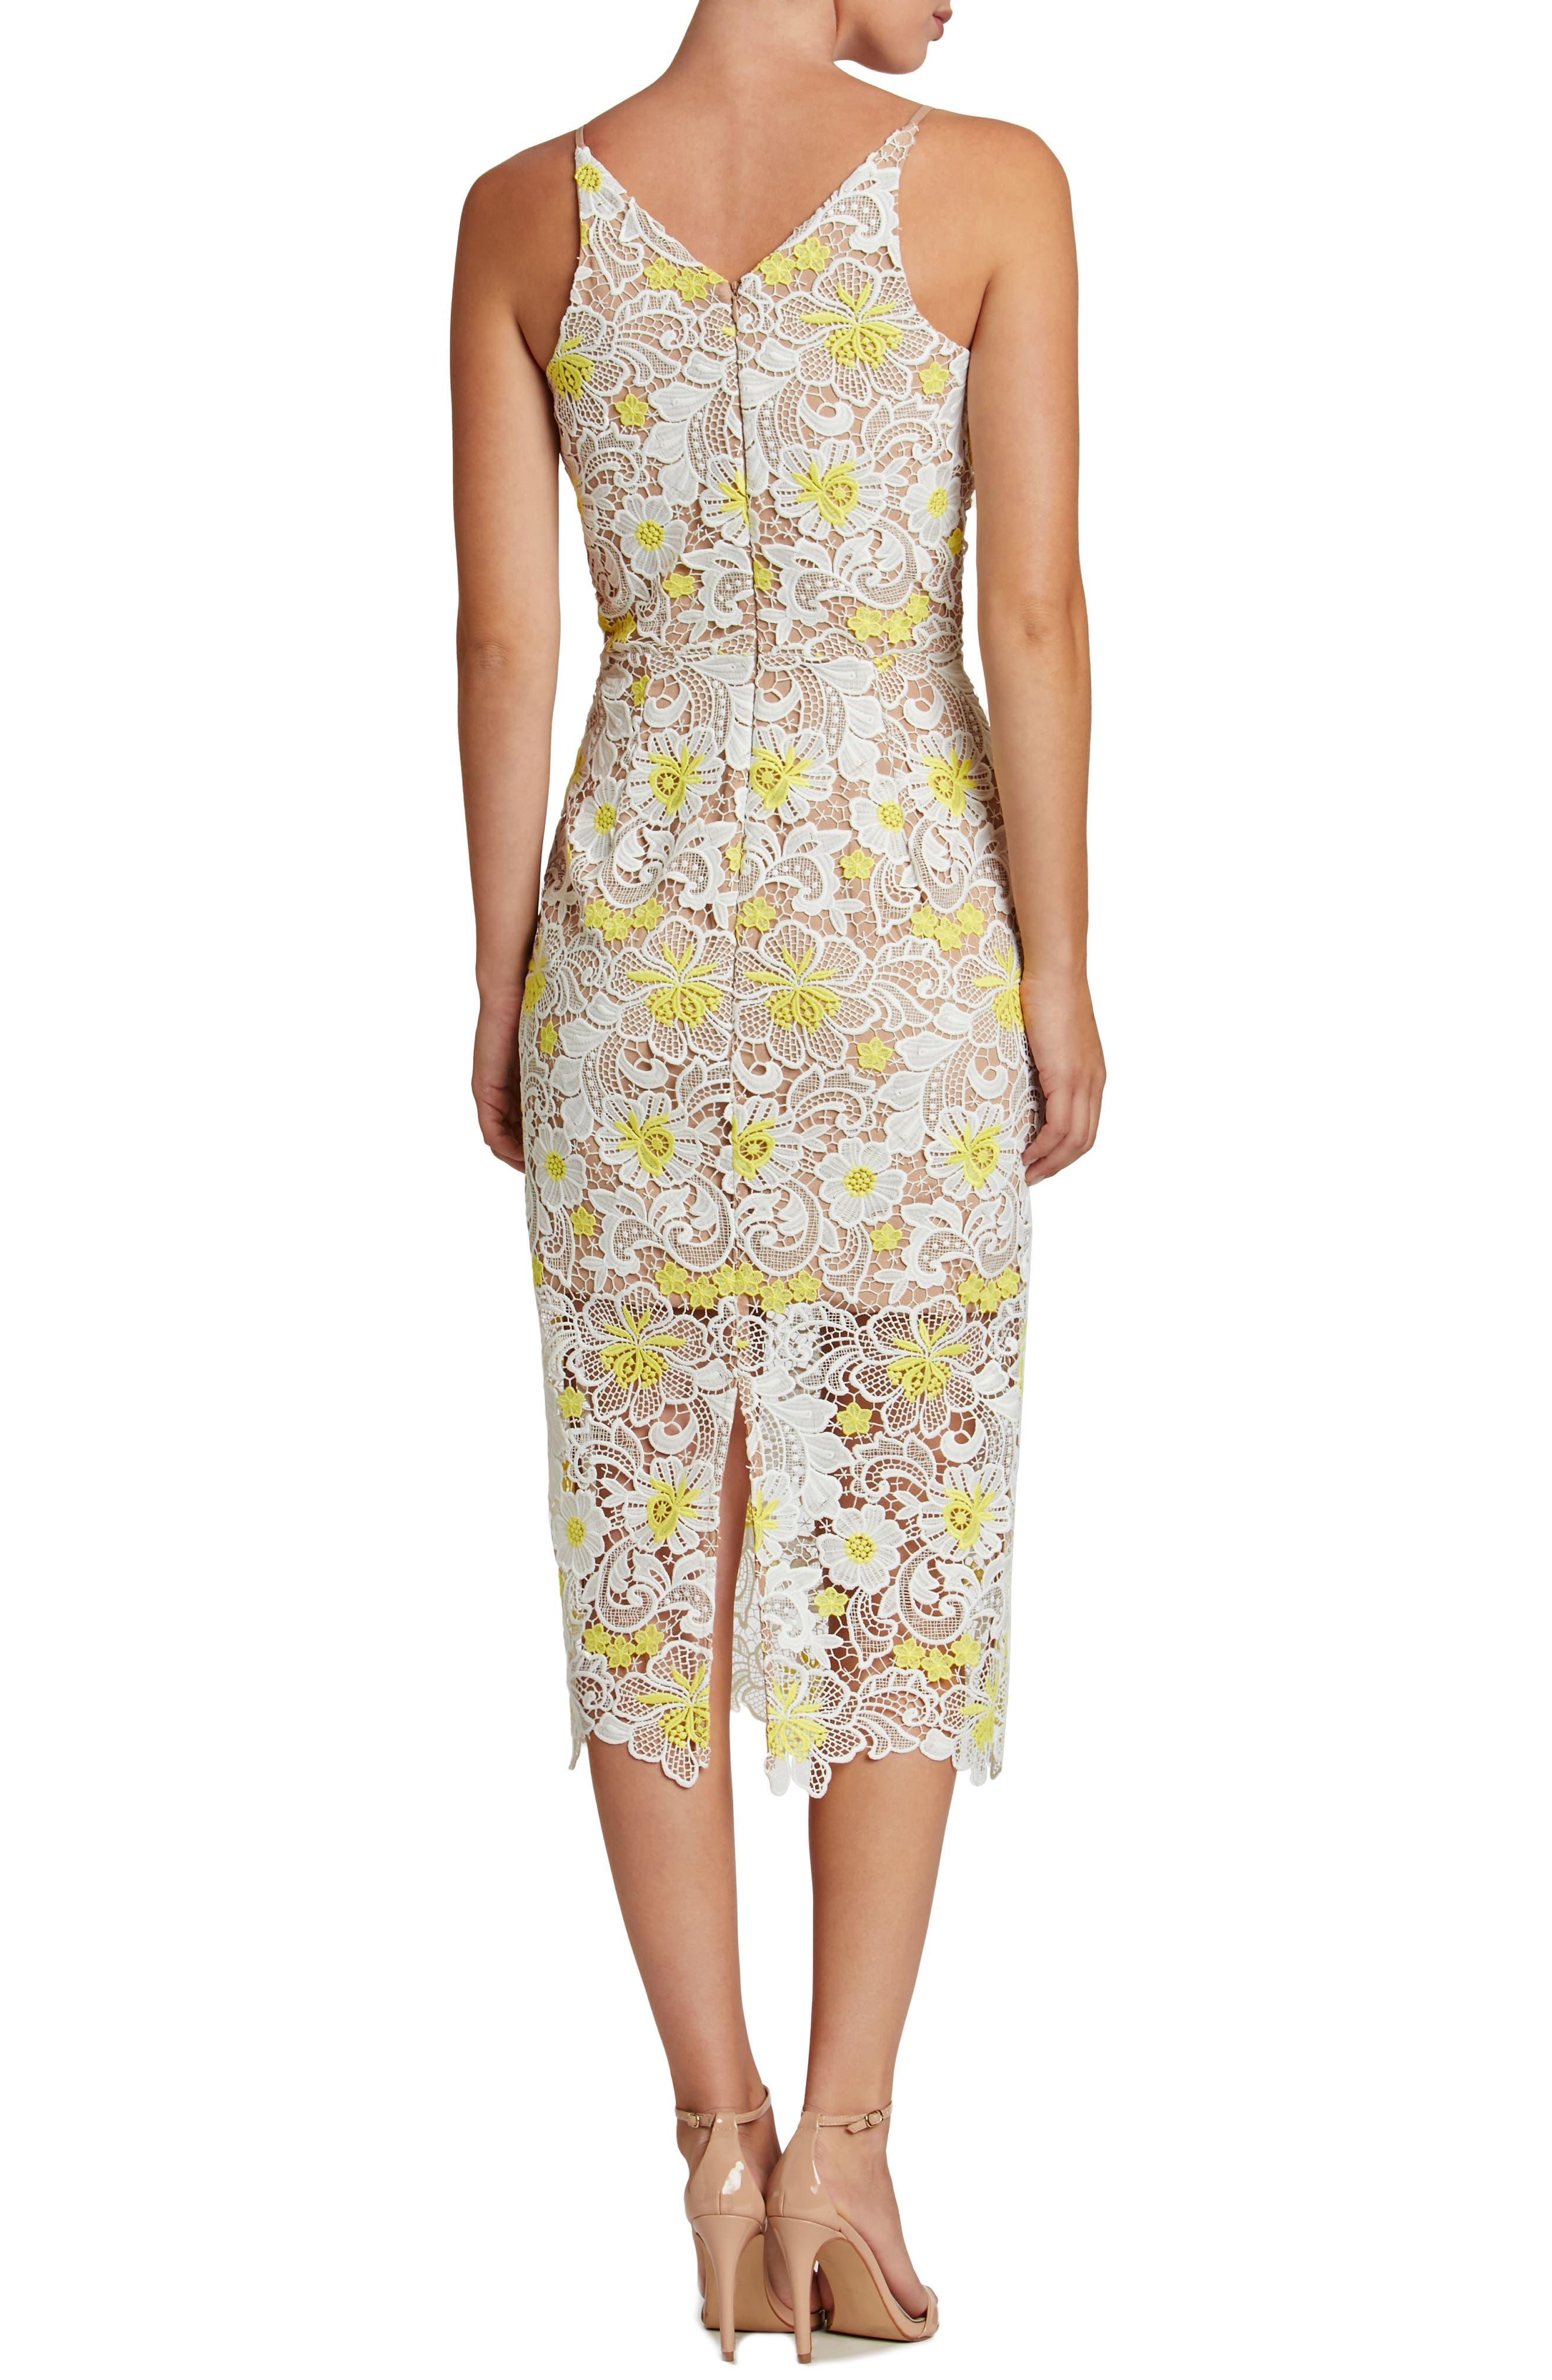 Aurora Floral Midi Dress,                             Alternate thumbnail 2, color,                             White/ Yellow Floral